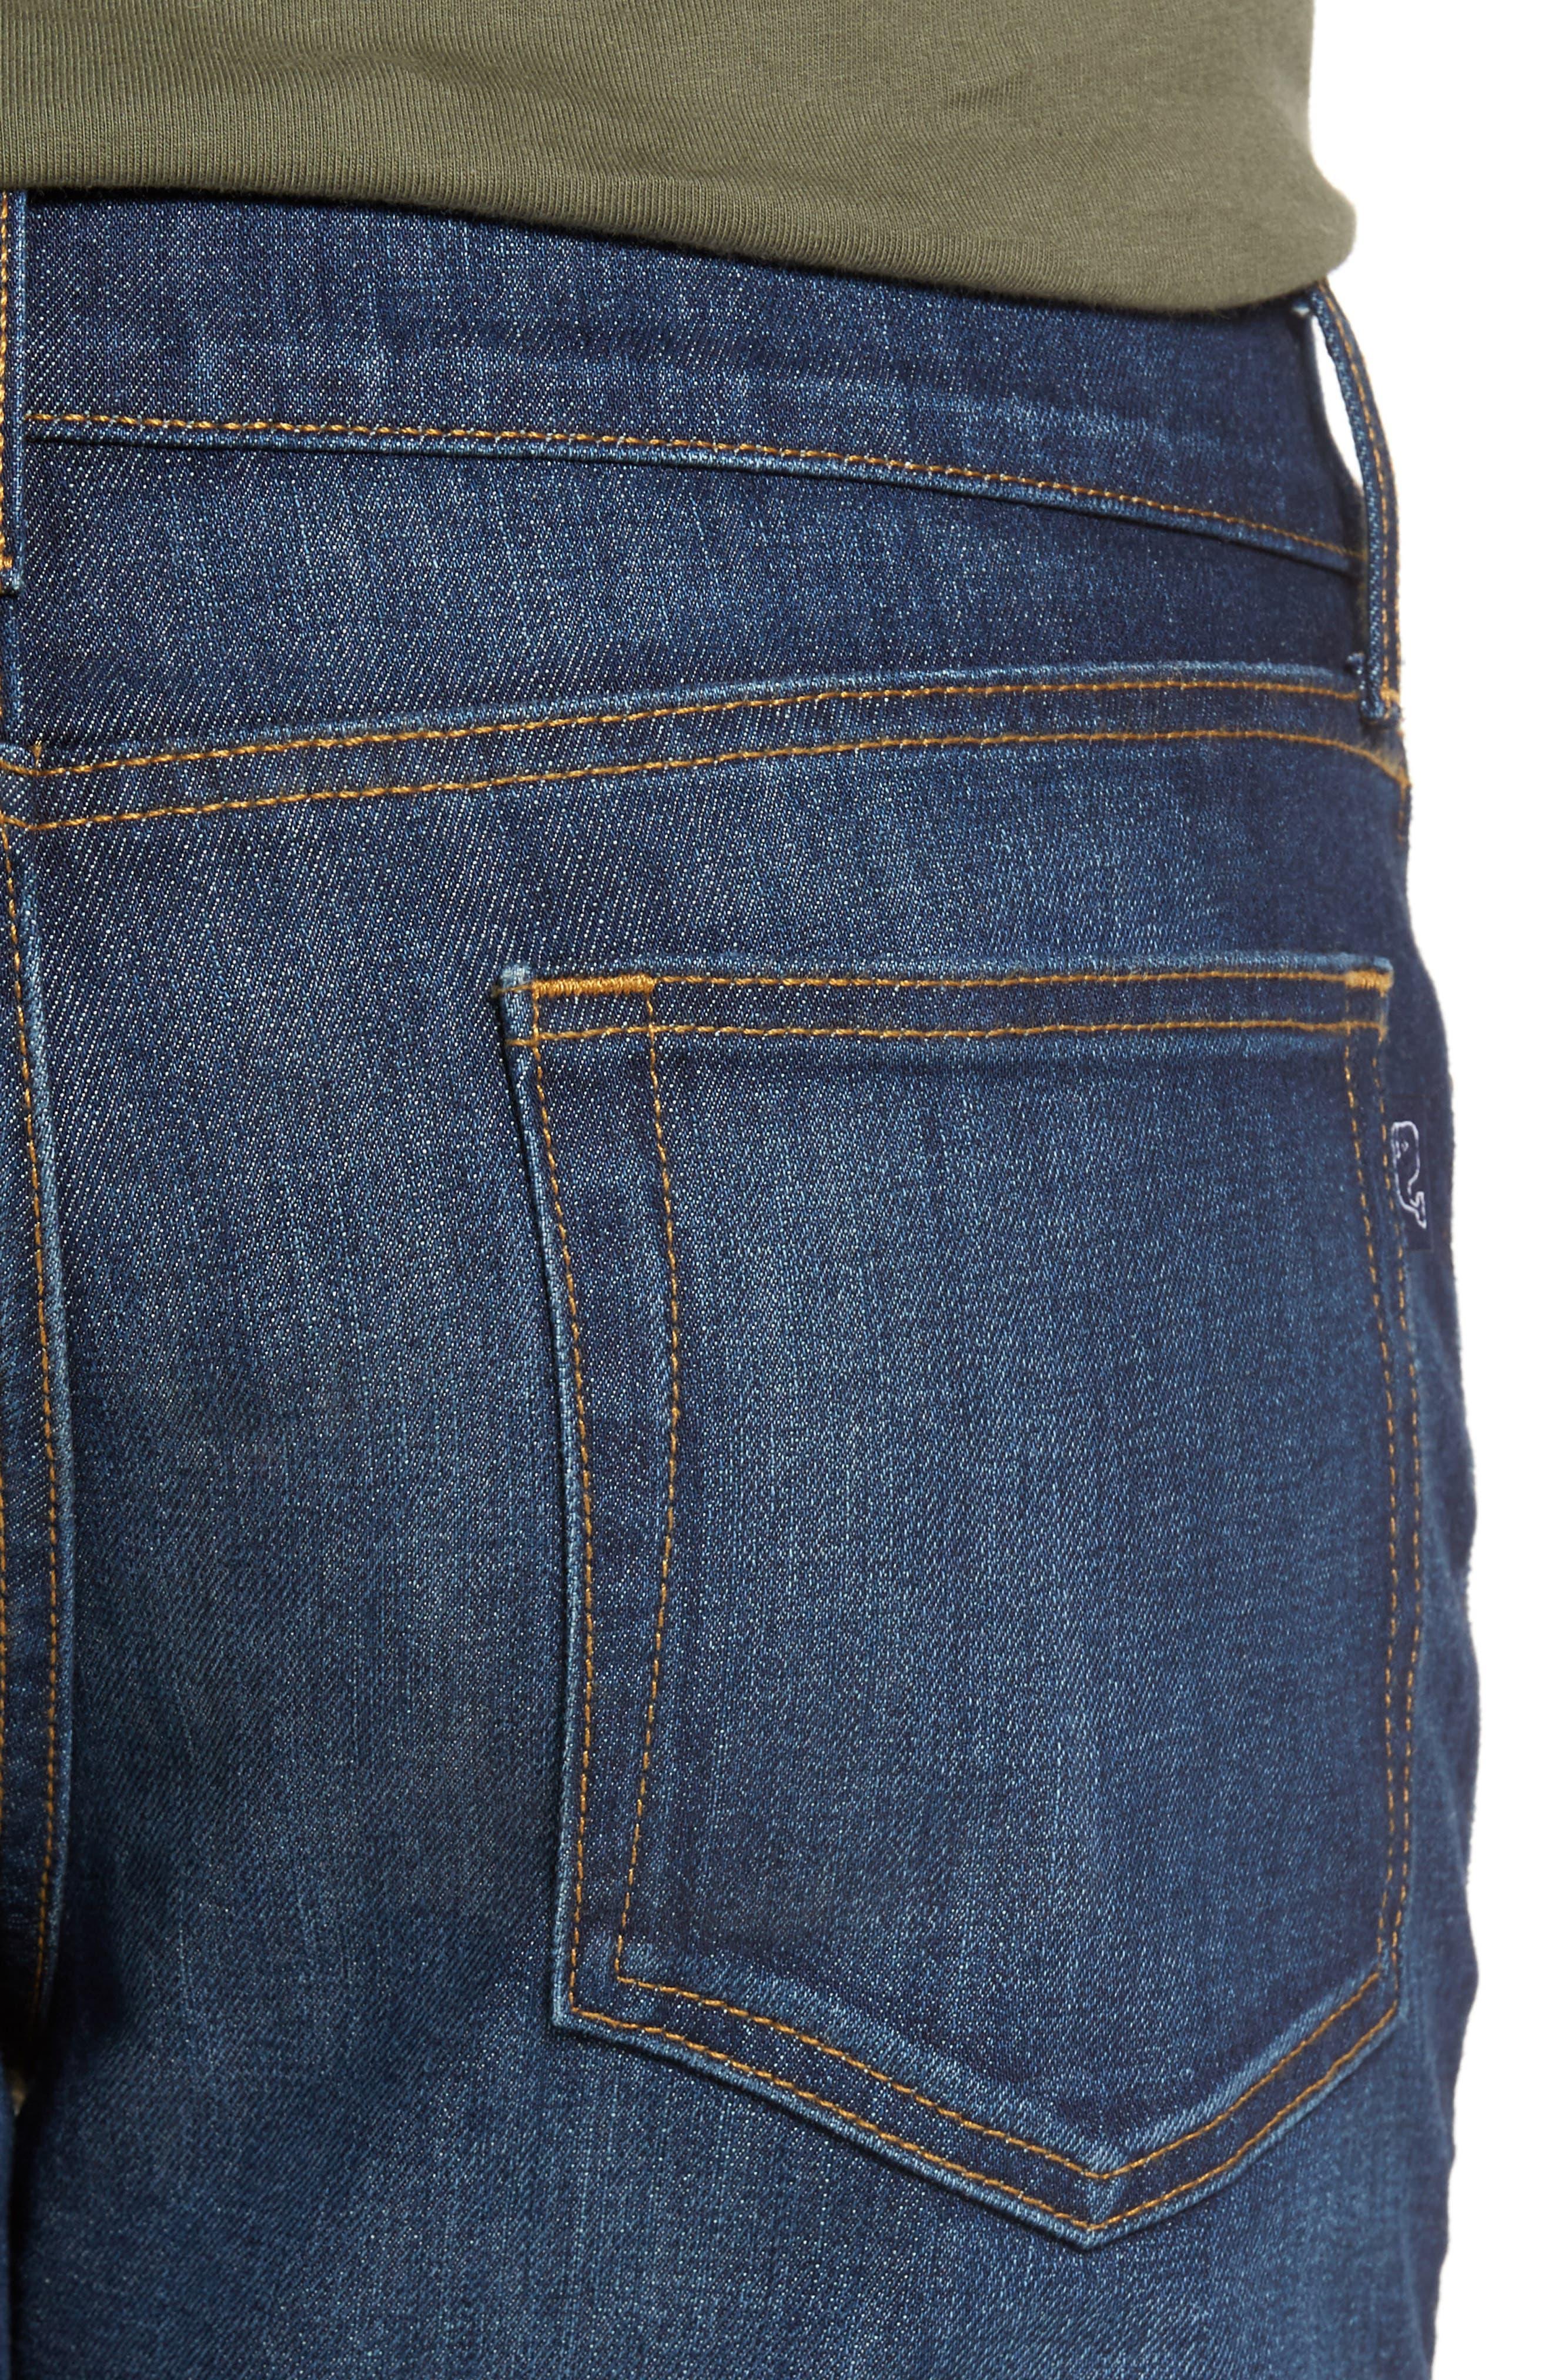 Slim Straight Leg Jeans,                             Alternate thumbnail 4, color,                             Hull Blue